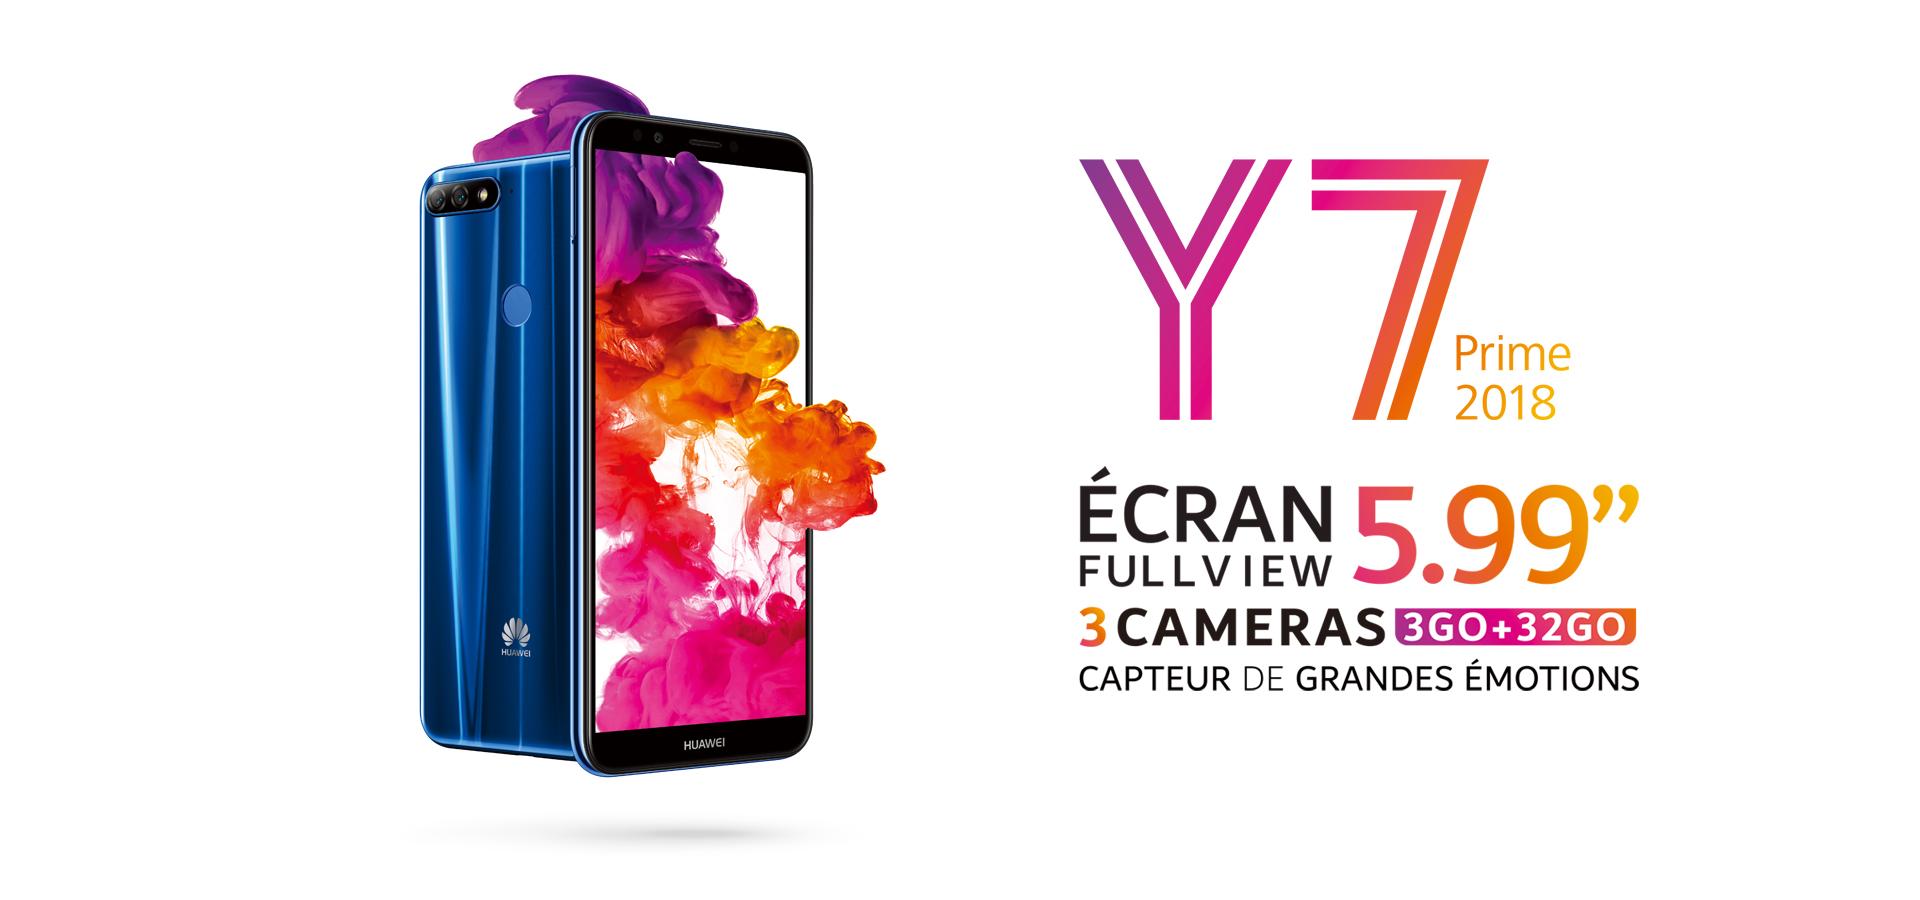 Huawei Y7 Prime 2018 Telephone Android Huawei Algeria